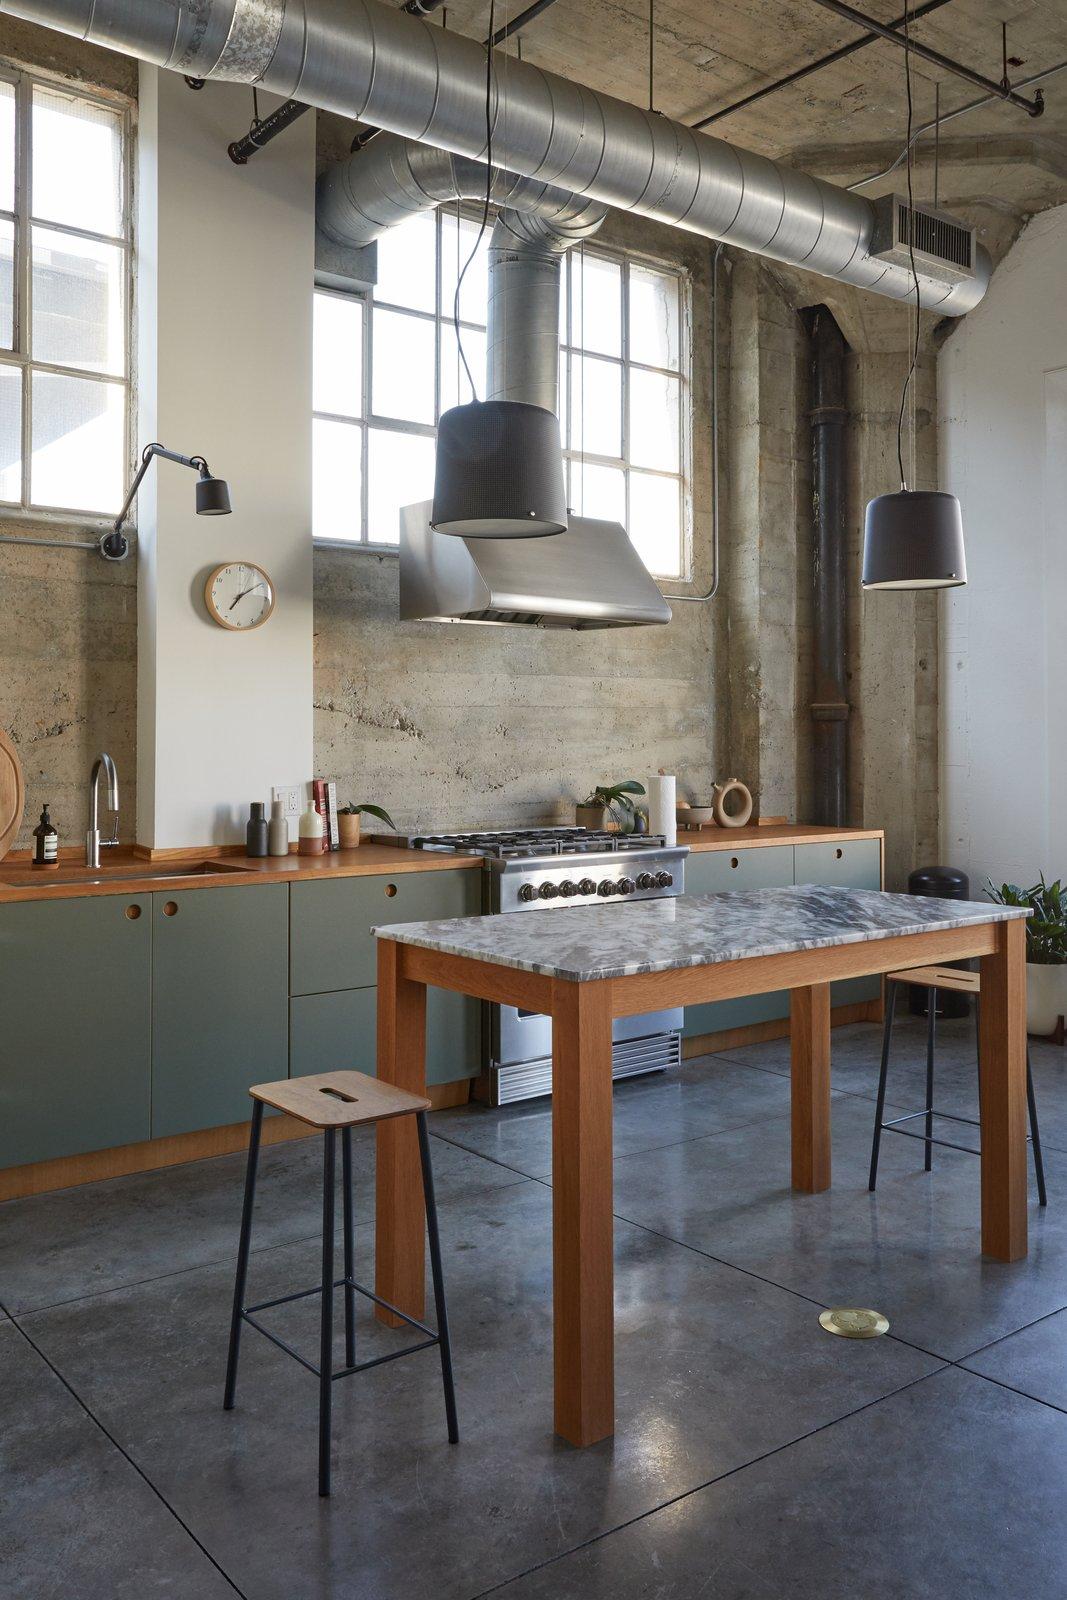 Walker Building Loft kitchen